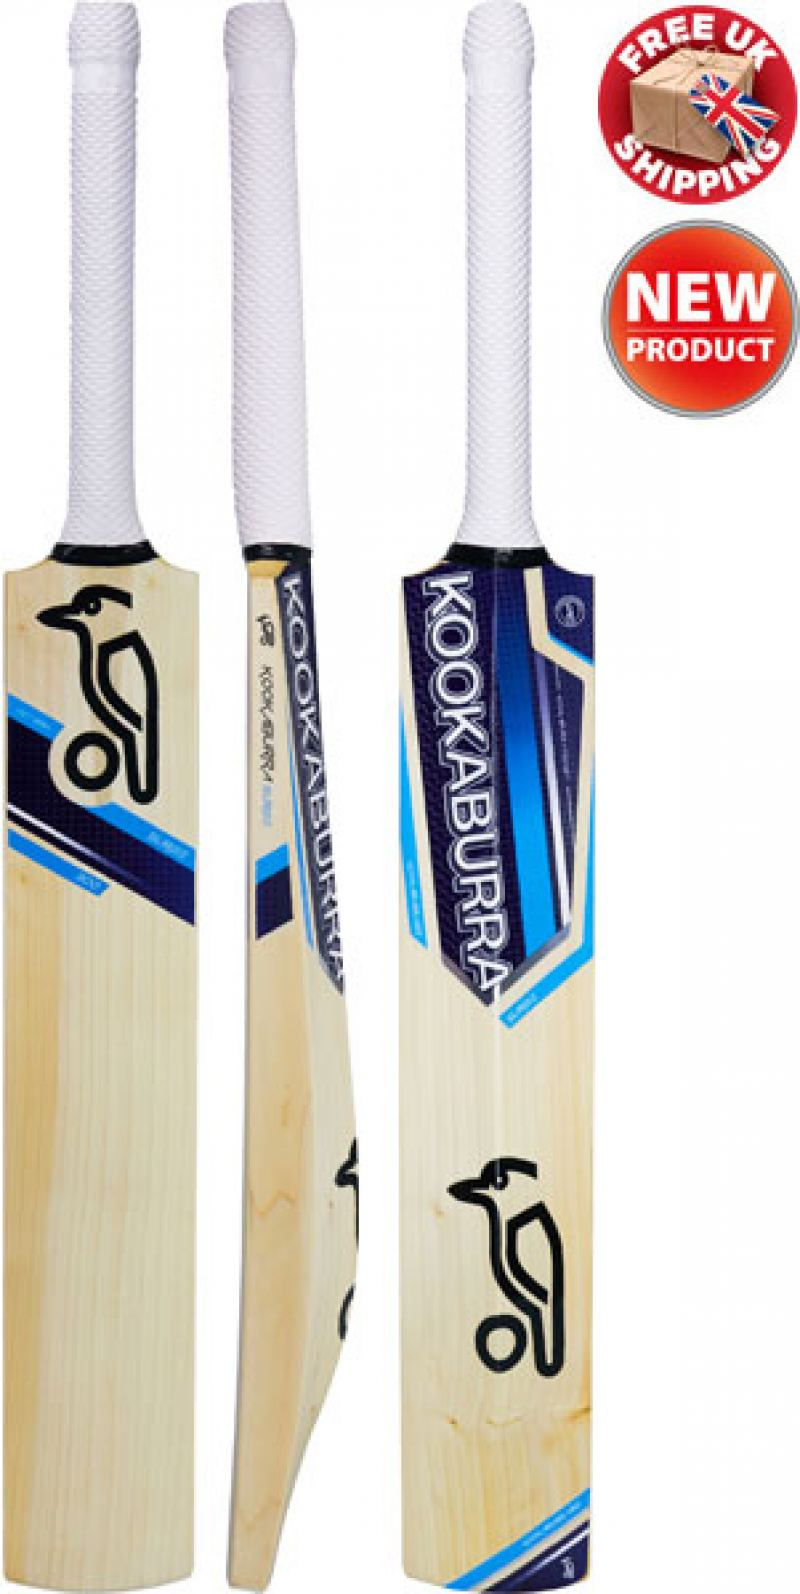 Kookaburra Surge 300 Cricket Bat